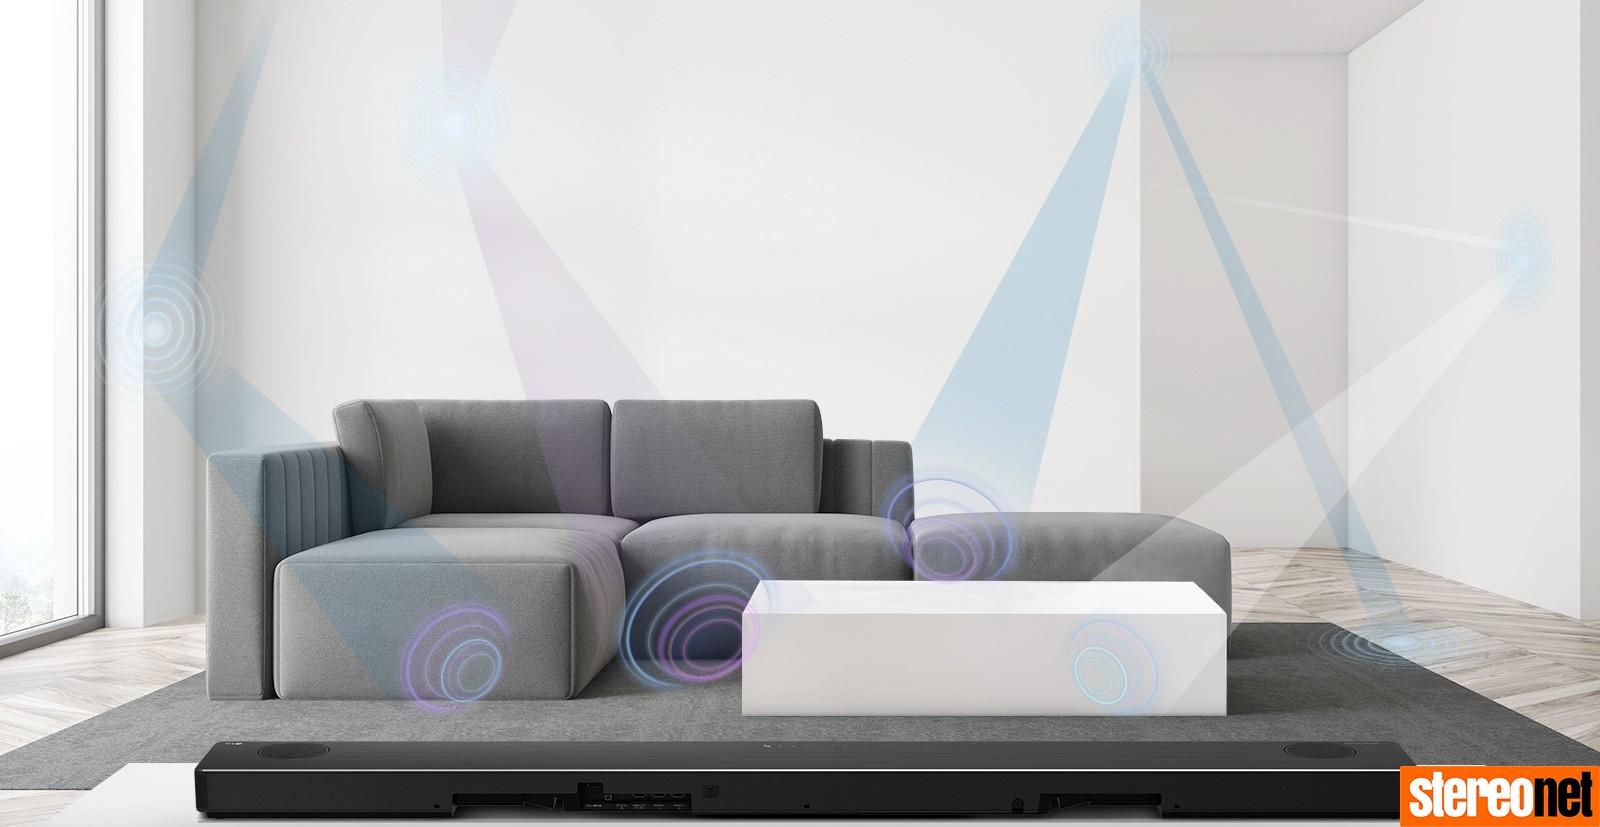 LG SN11RG Soundbar CES 2020